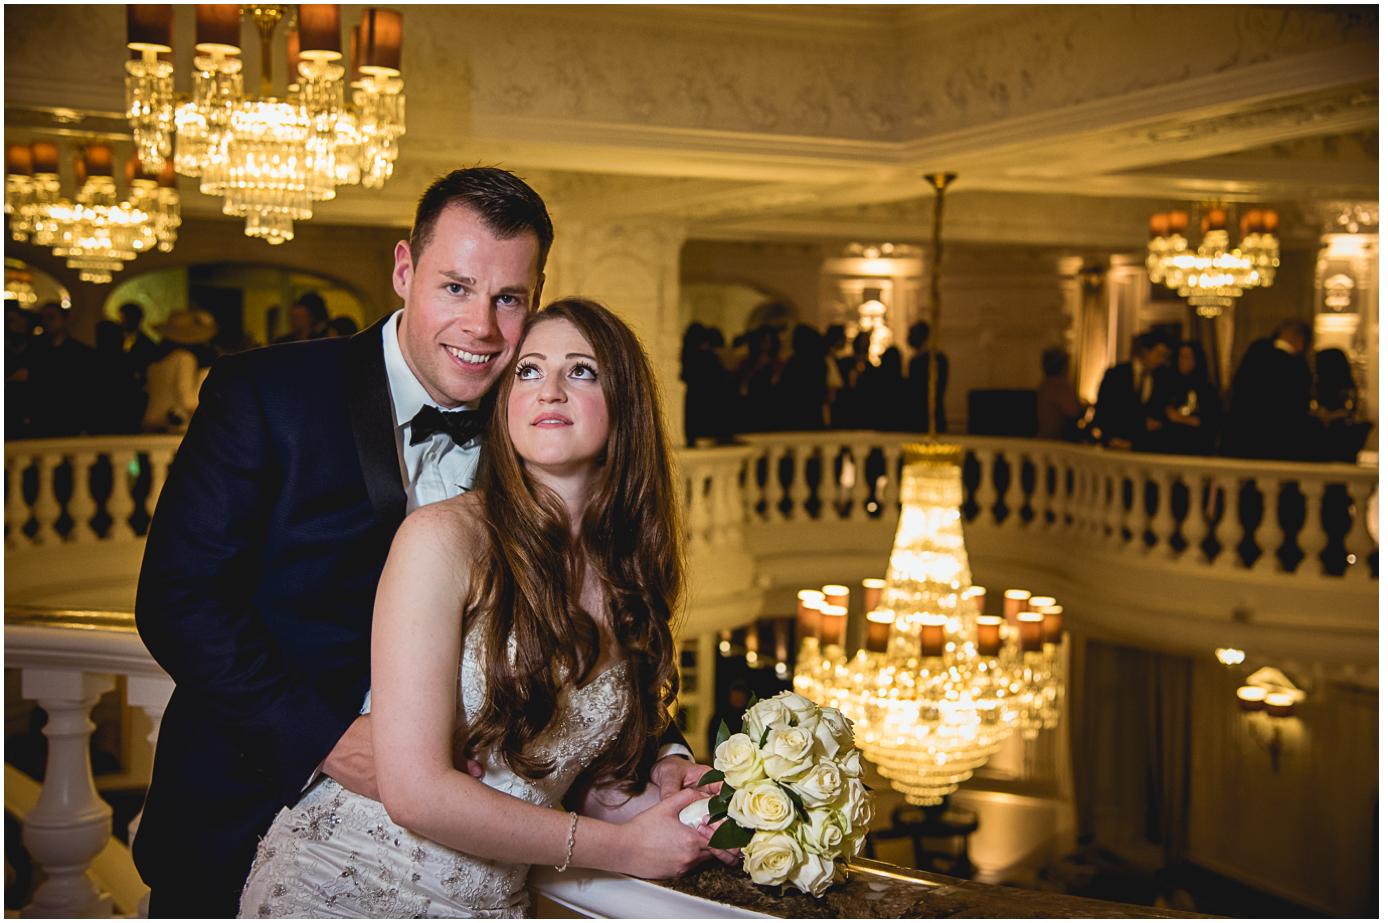 47 - Esmat and Angus - St. Ermin's Hotel London wedding photographer